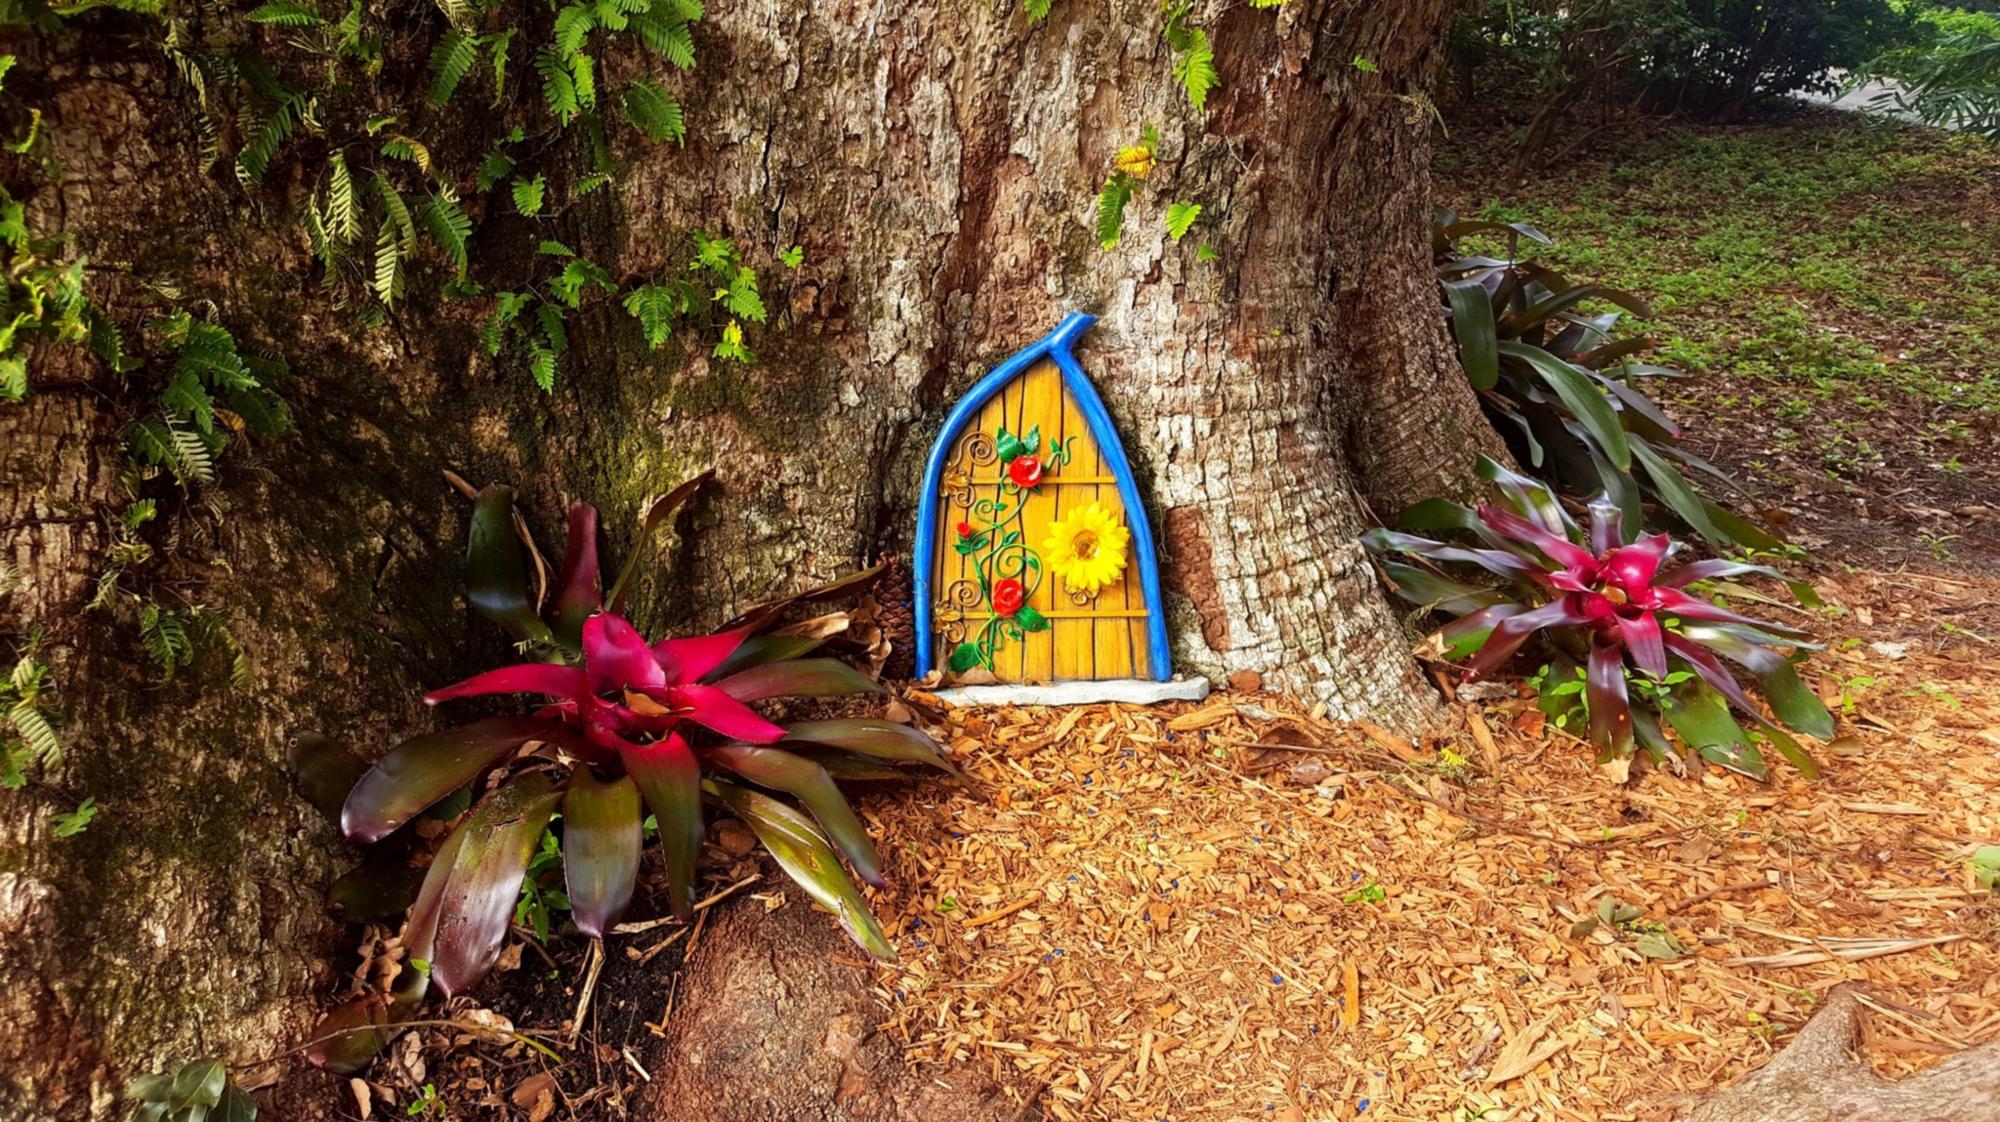 Fairy Doors enchant at Leu Gardens - Orlando Sentinel